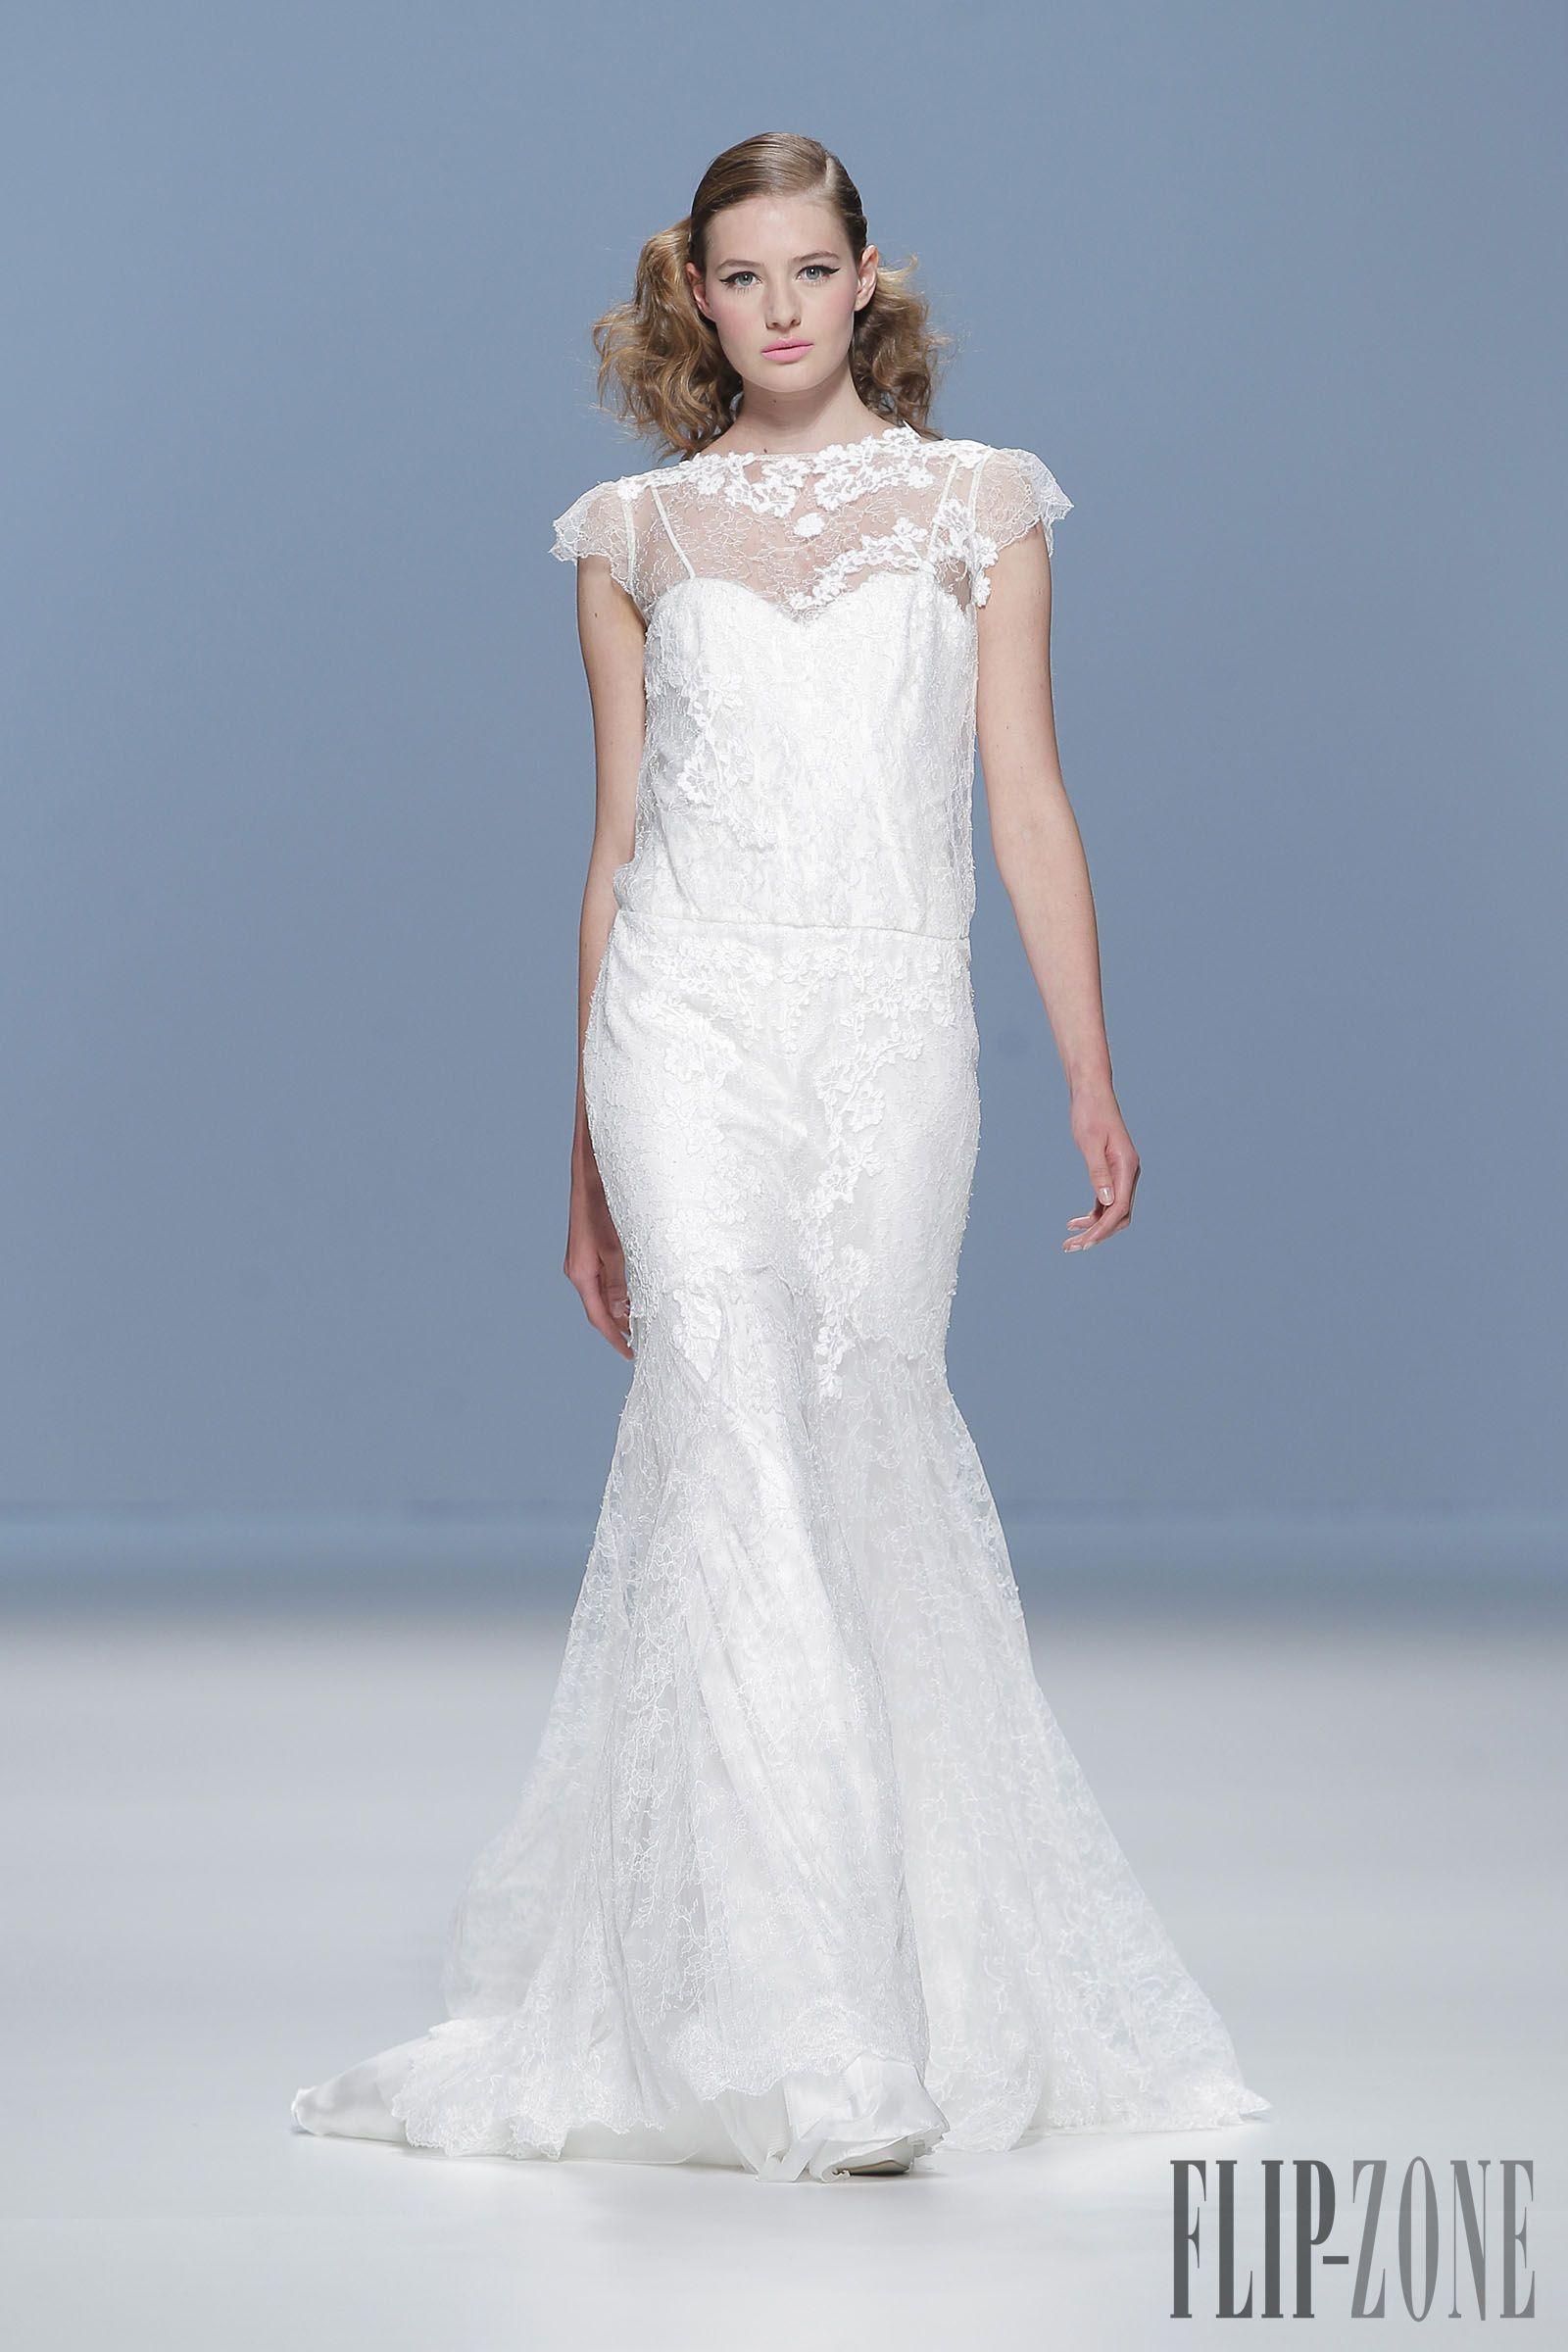 Cymbeline 2015 Collection Bridal 2015 Wedding Dresses Wedding Dresses Dresses [ 2400 x 1600 Pixel ]